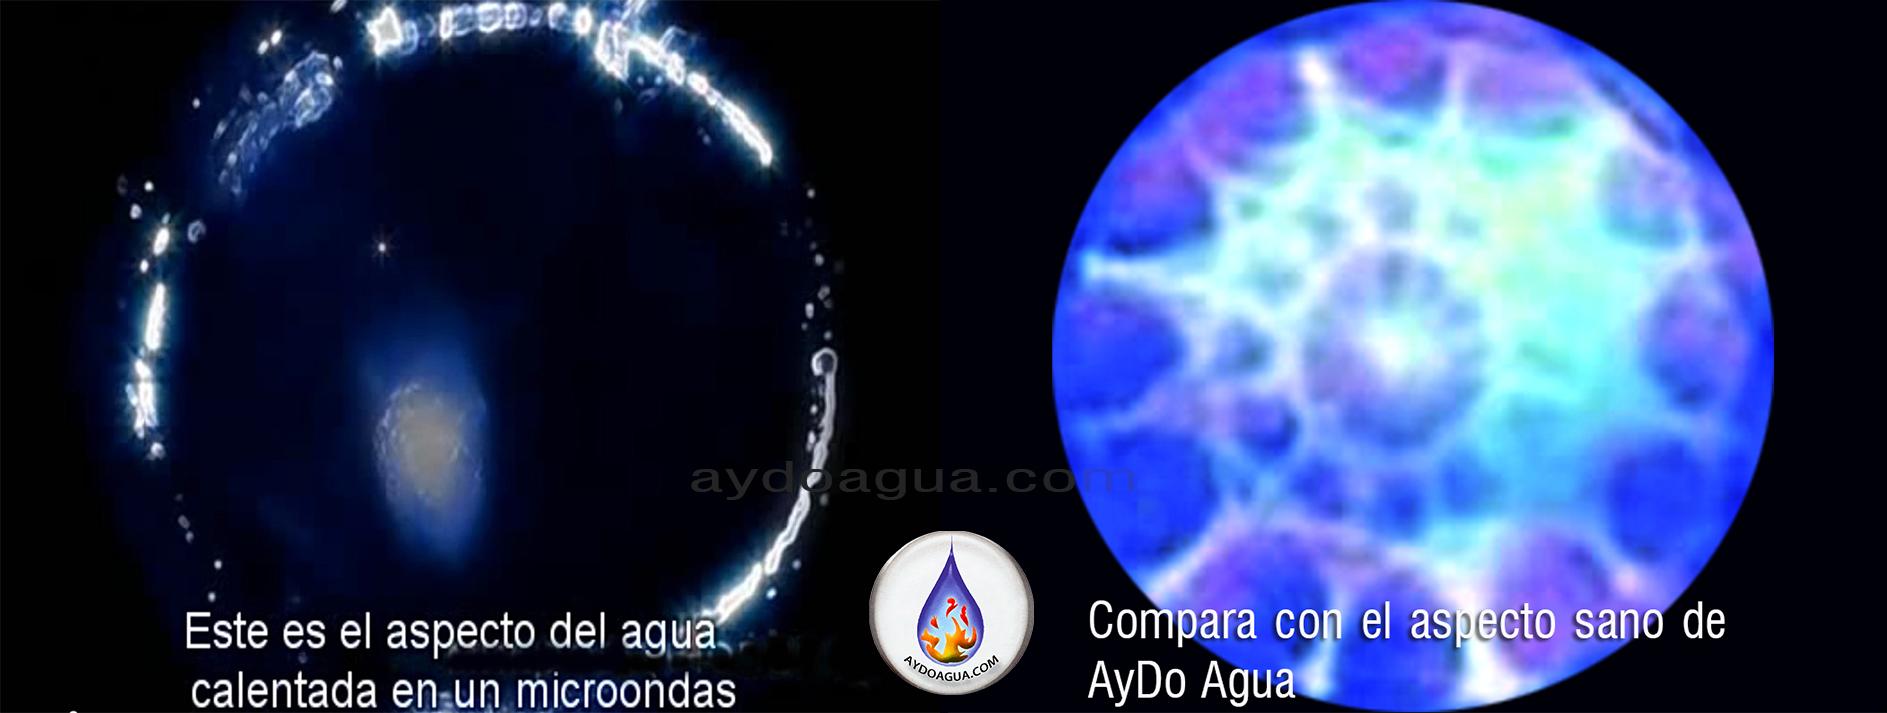 calentar-agua –microondas-aydoagua.com